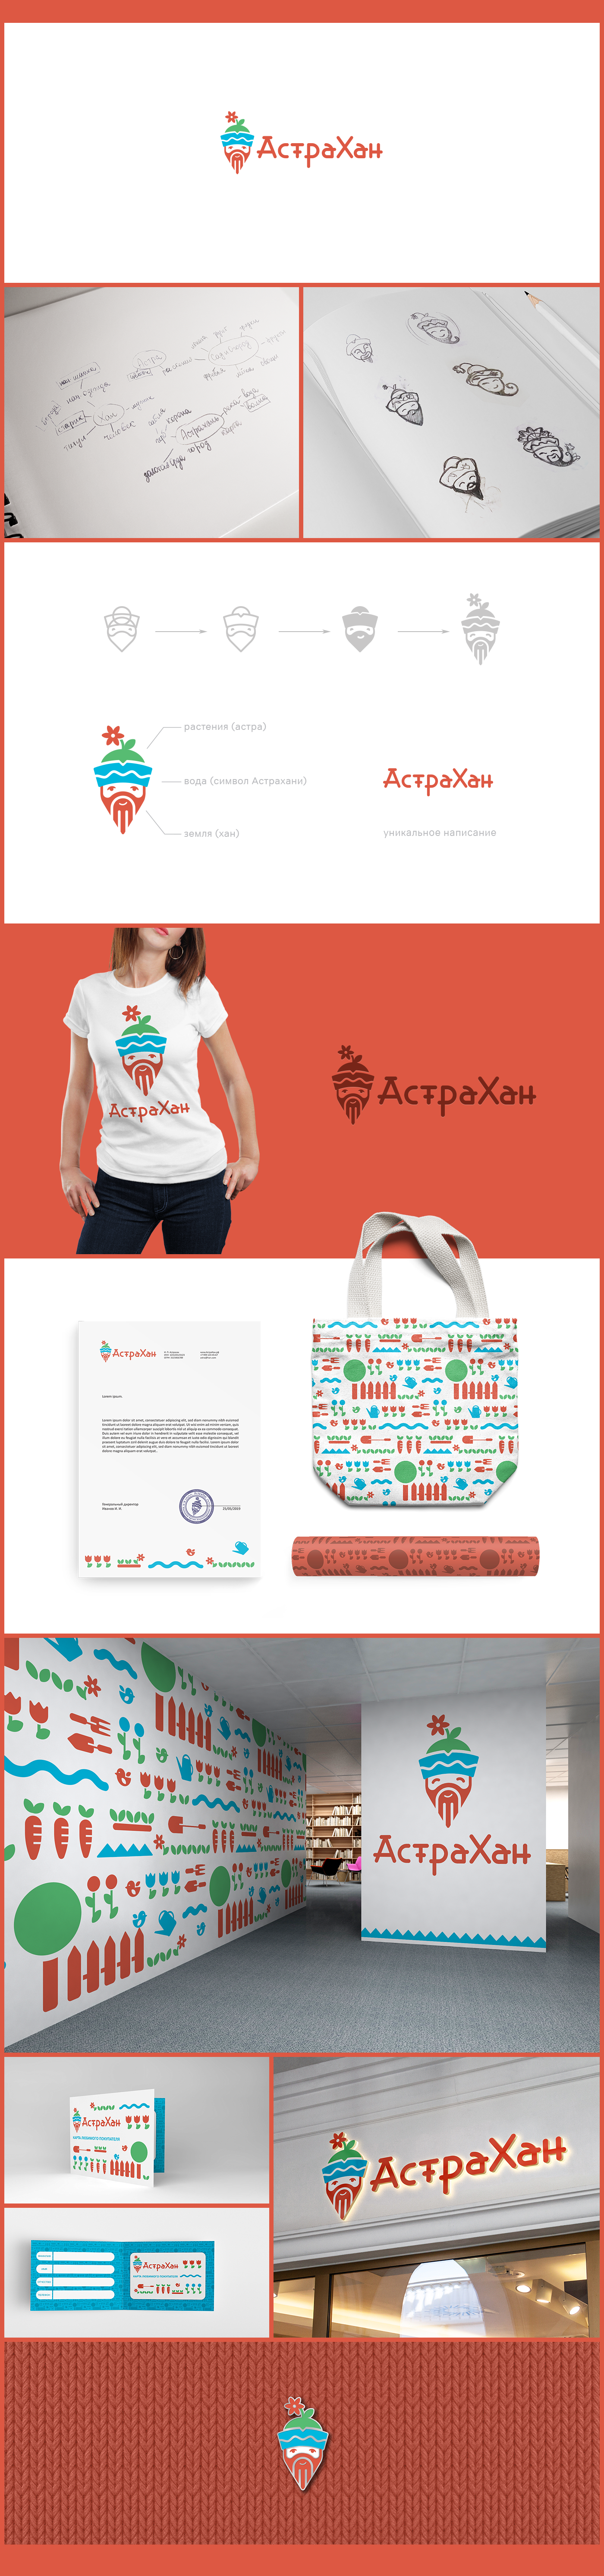 Астрахан_стиль.png